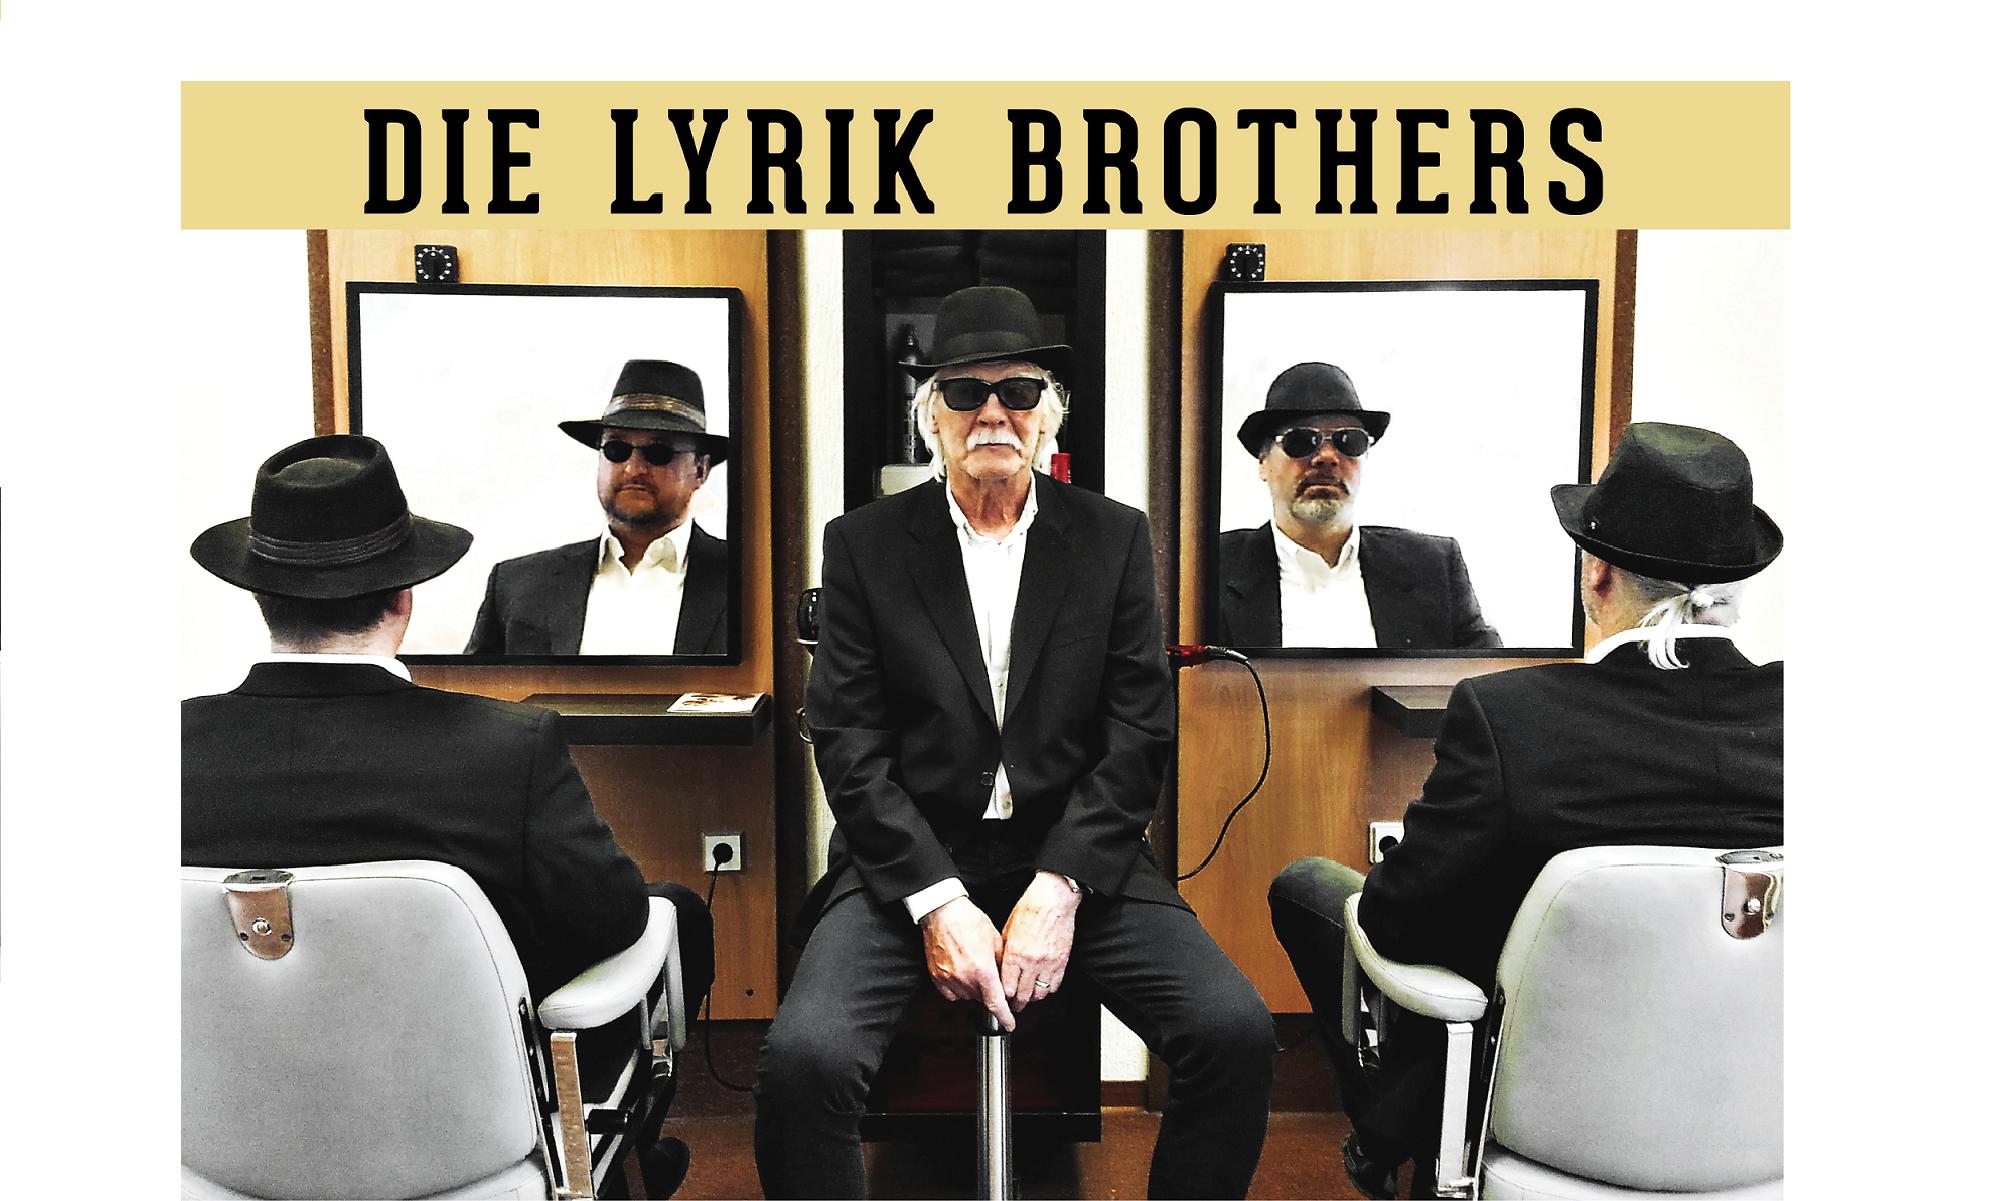 Lyrik Brothers